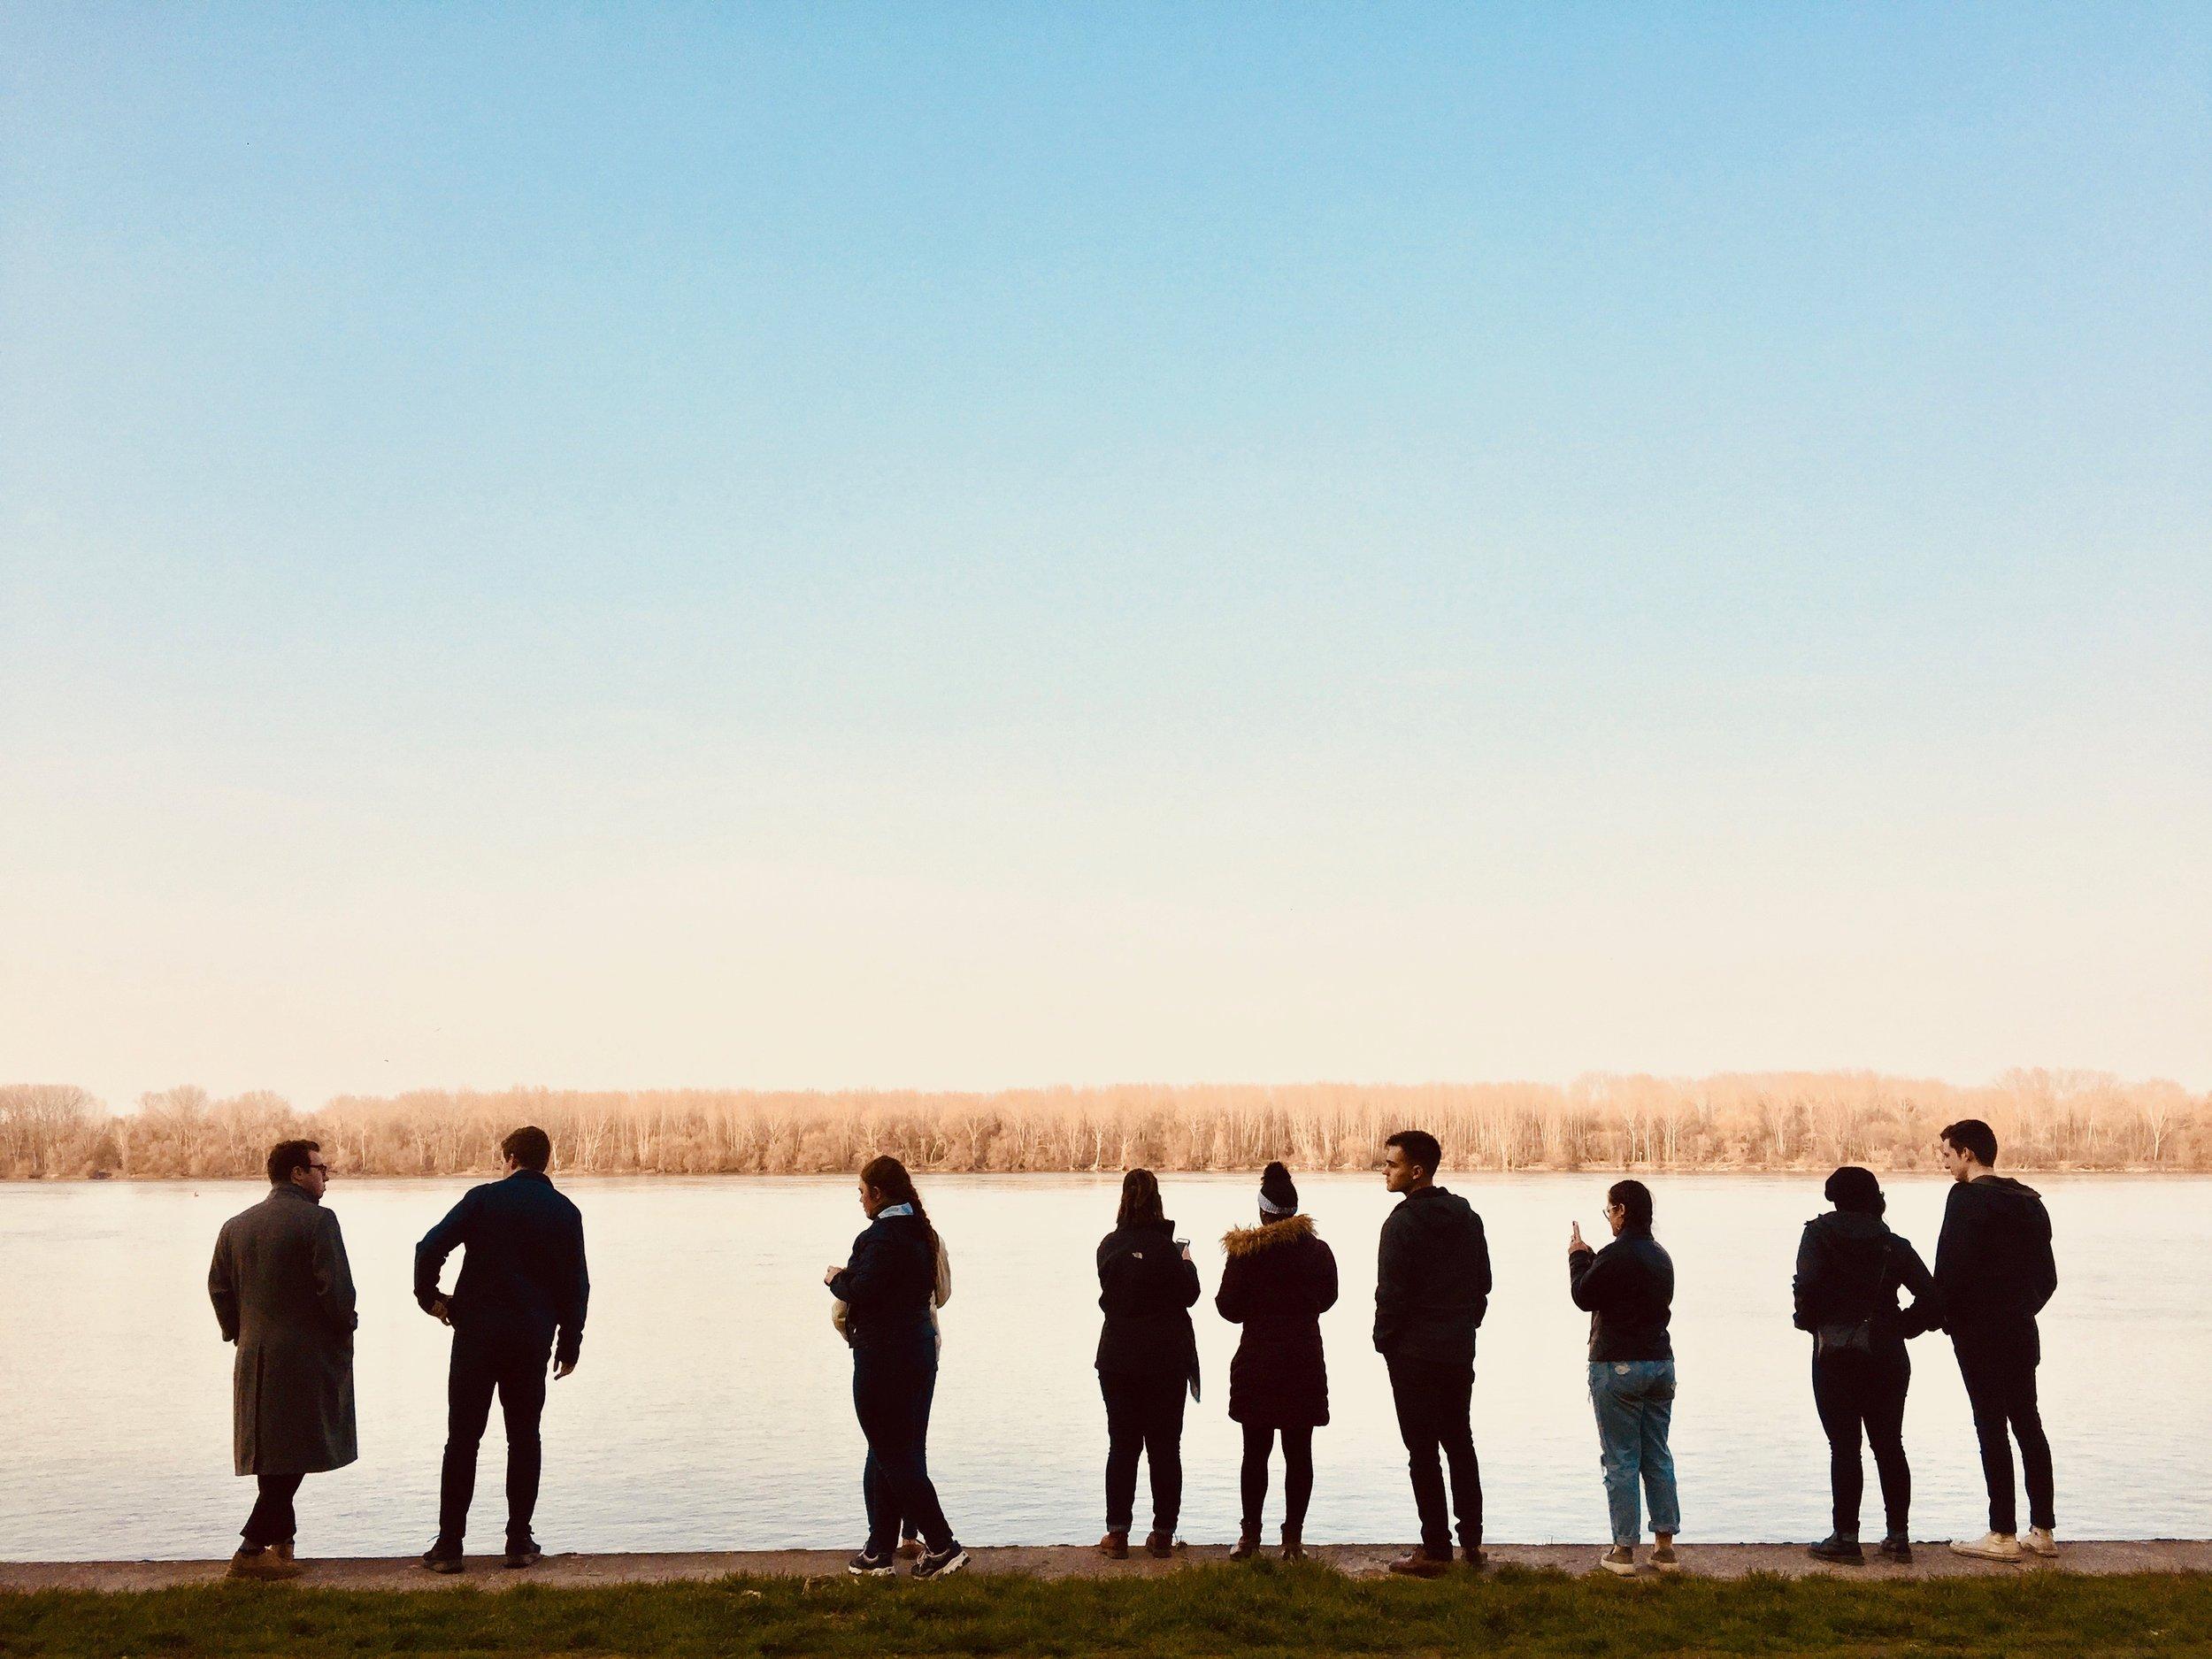 Standing on the banks of the Danube in Vukovar, Croatia